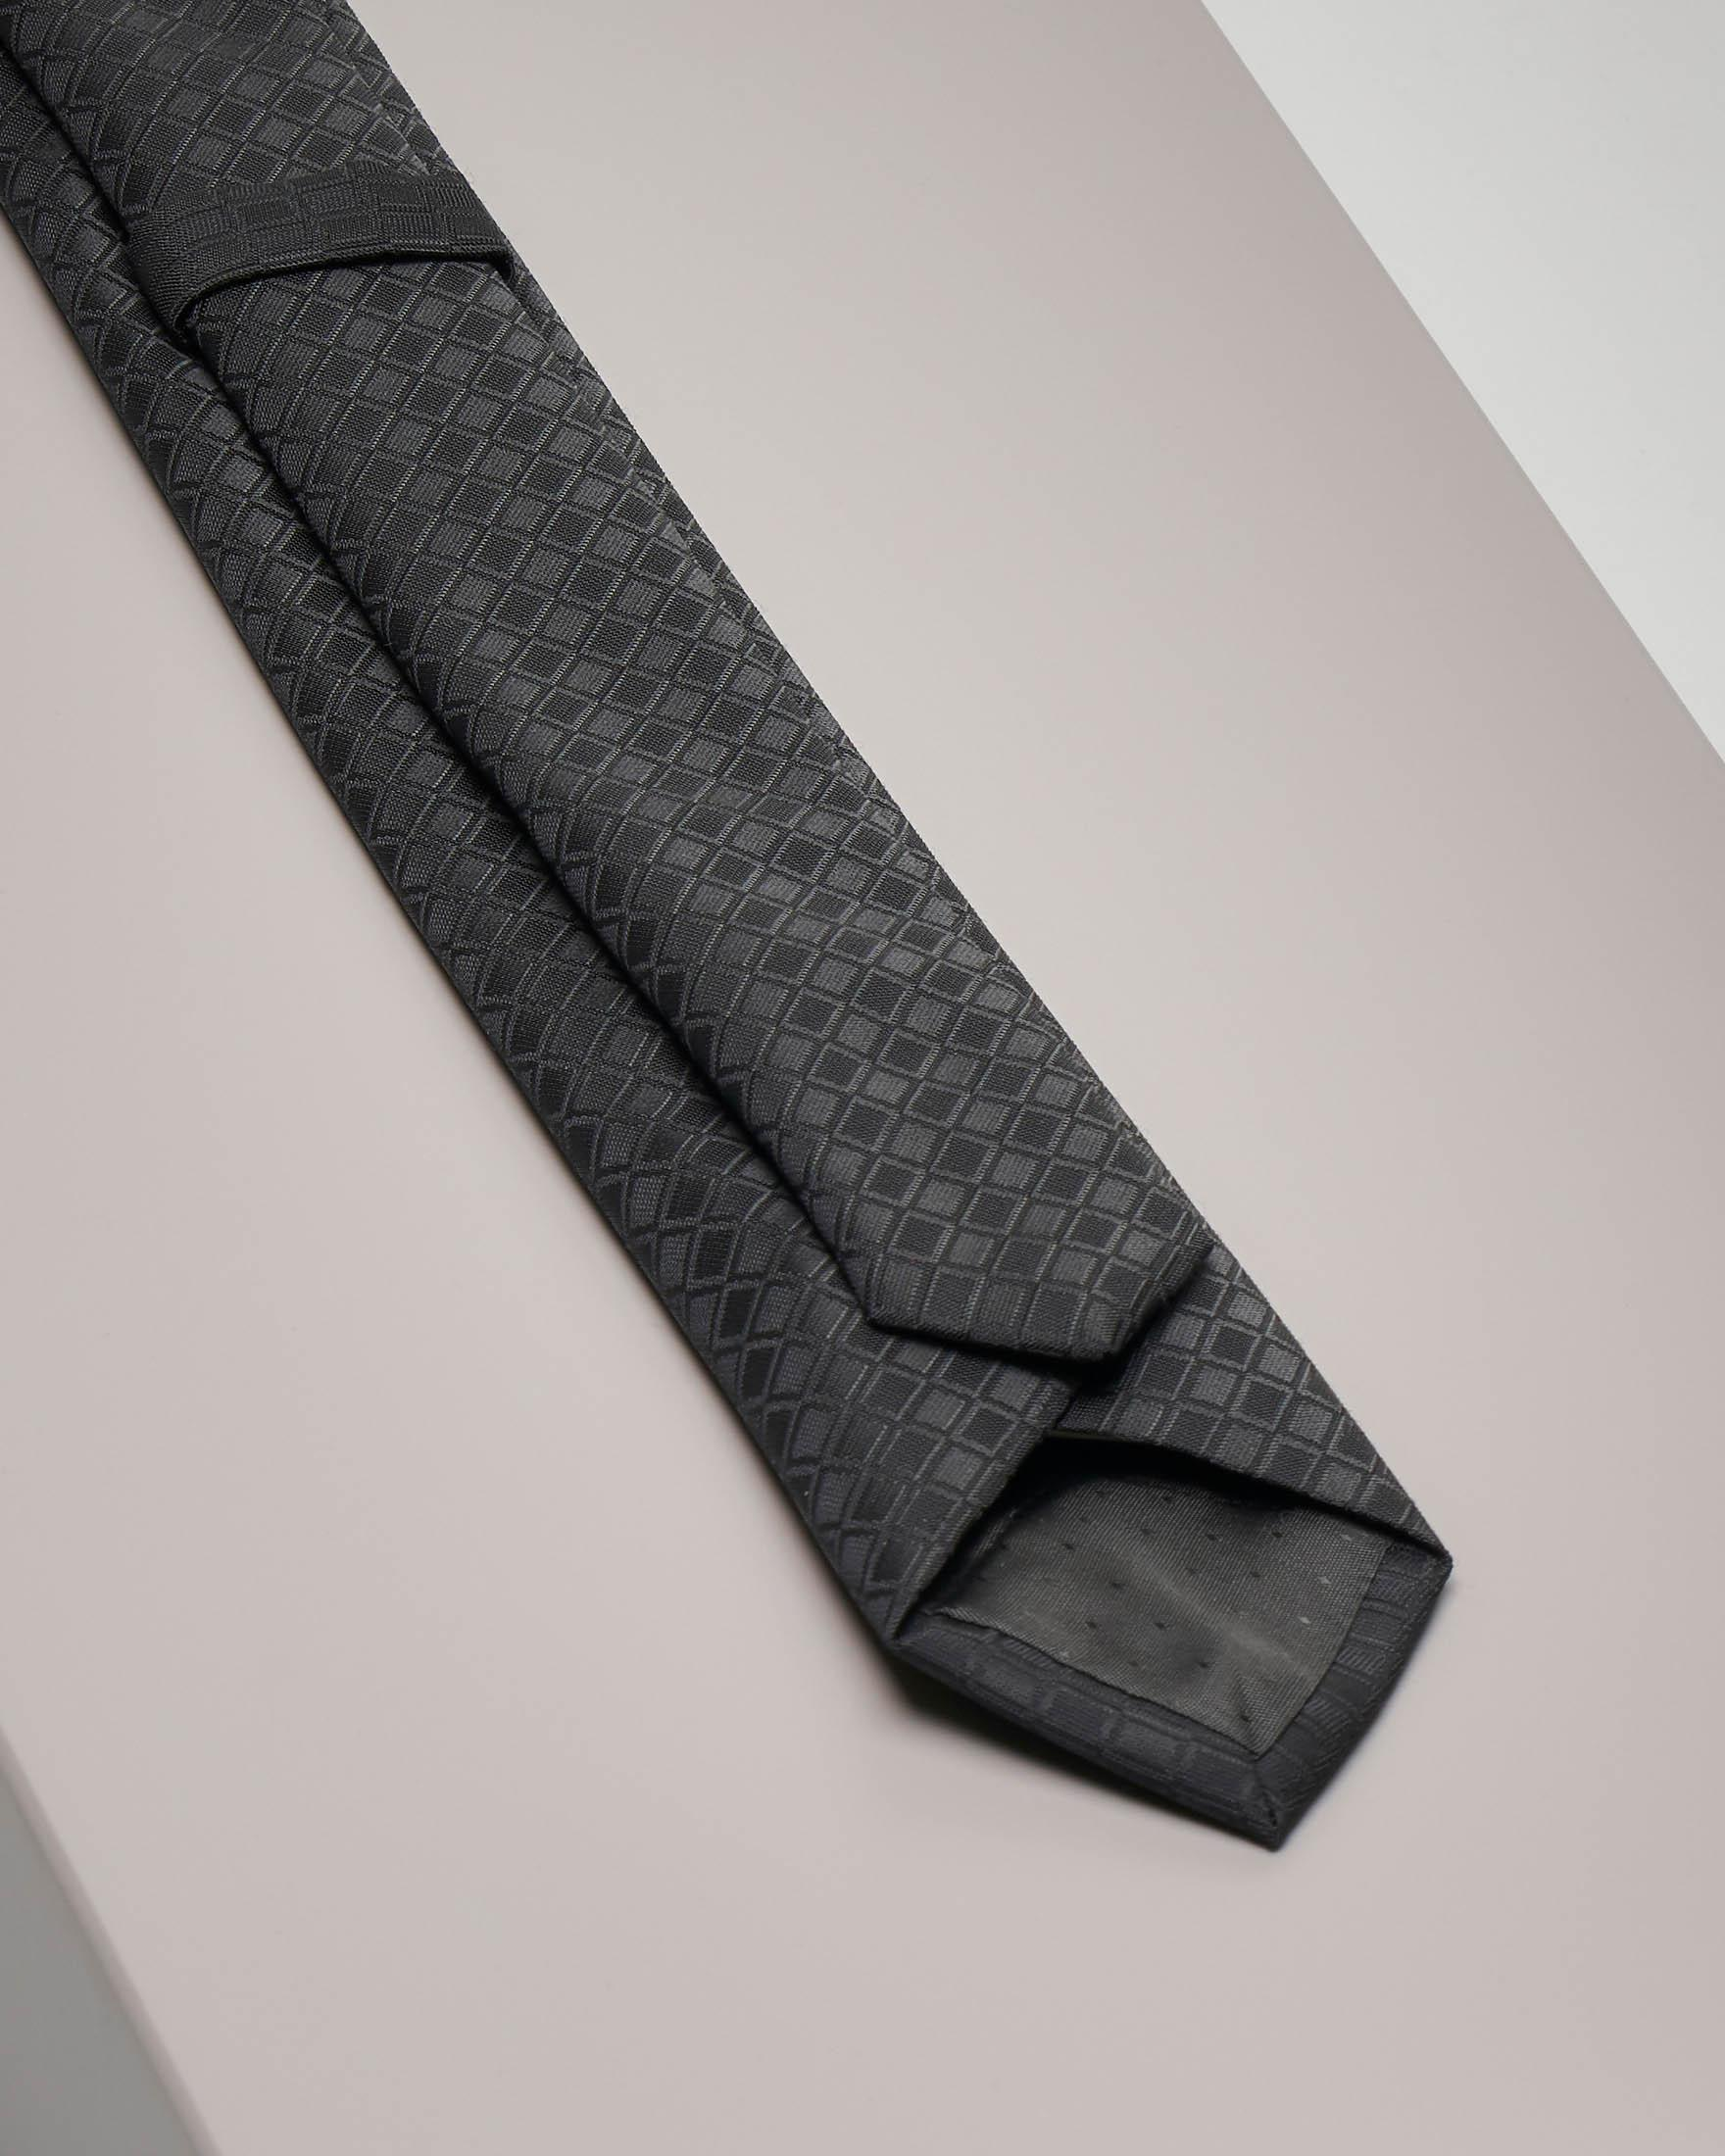 Cravatta nera fantasia rombetto